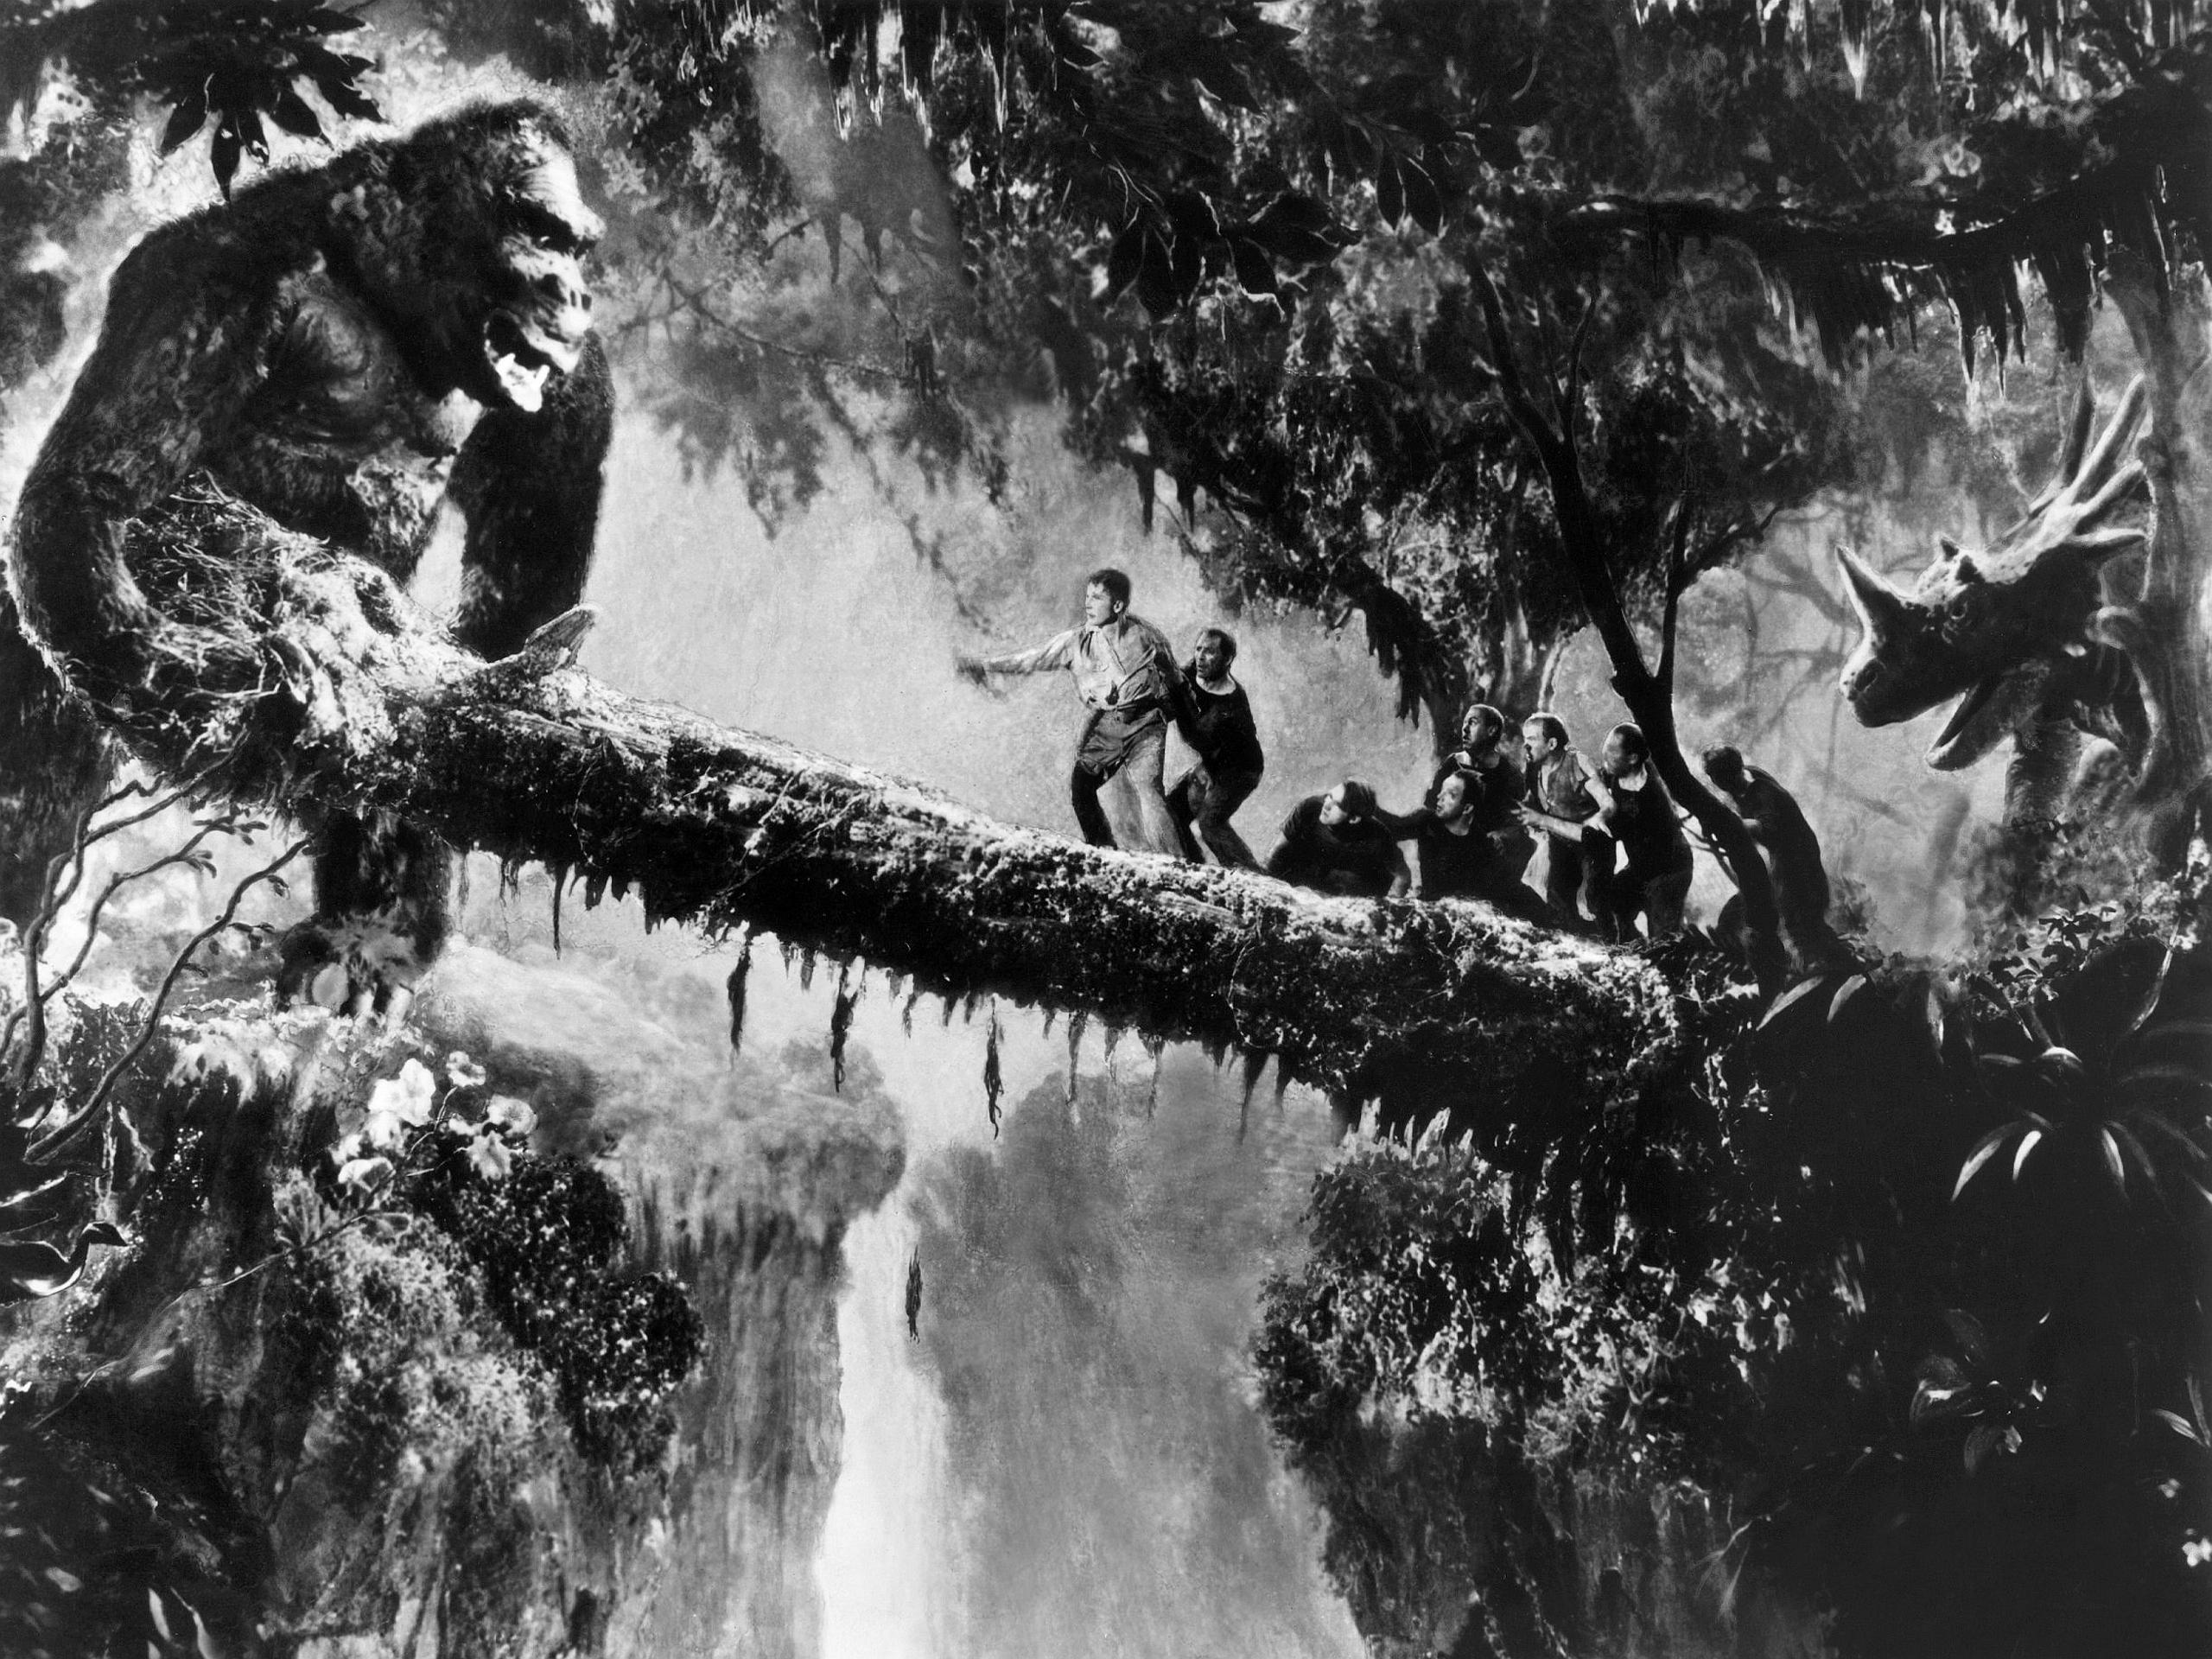 Free Download Movie King Kong 1933 King Kong Wallpaper 2560x1920 For Your Desktop Mobile Tablet Explore 49 King Kong Wallpaper 1933 King Kong Wallpaper 1933 King Kong Wallpapers King Kong Wallpaper